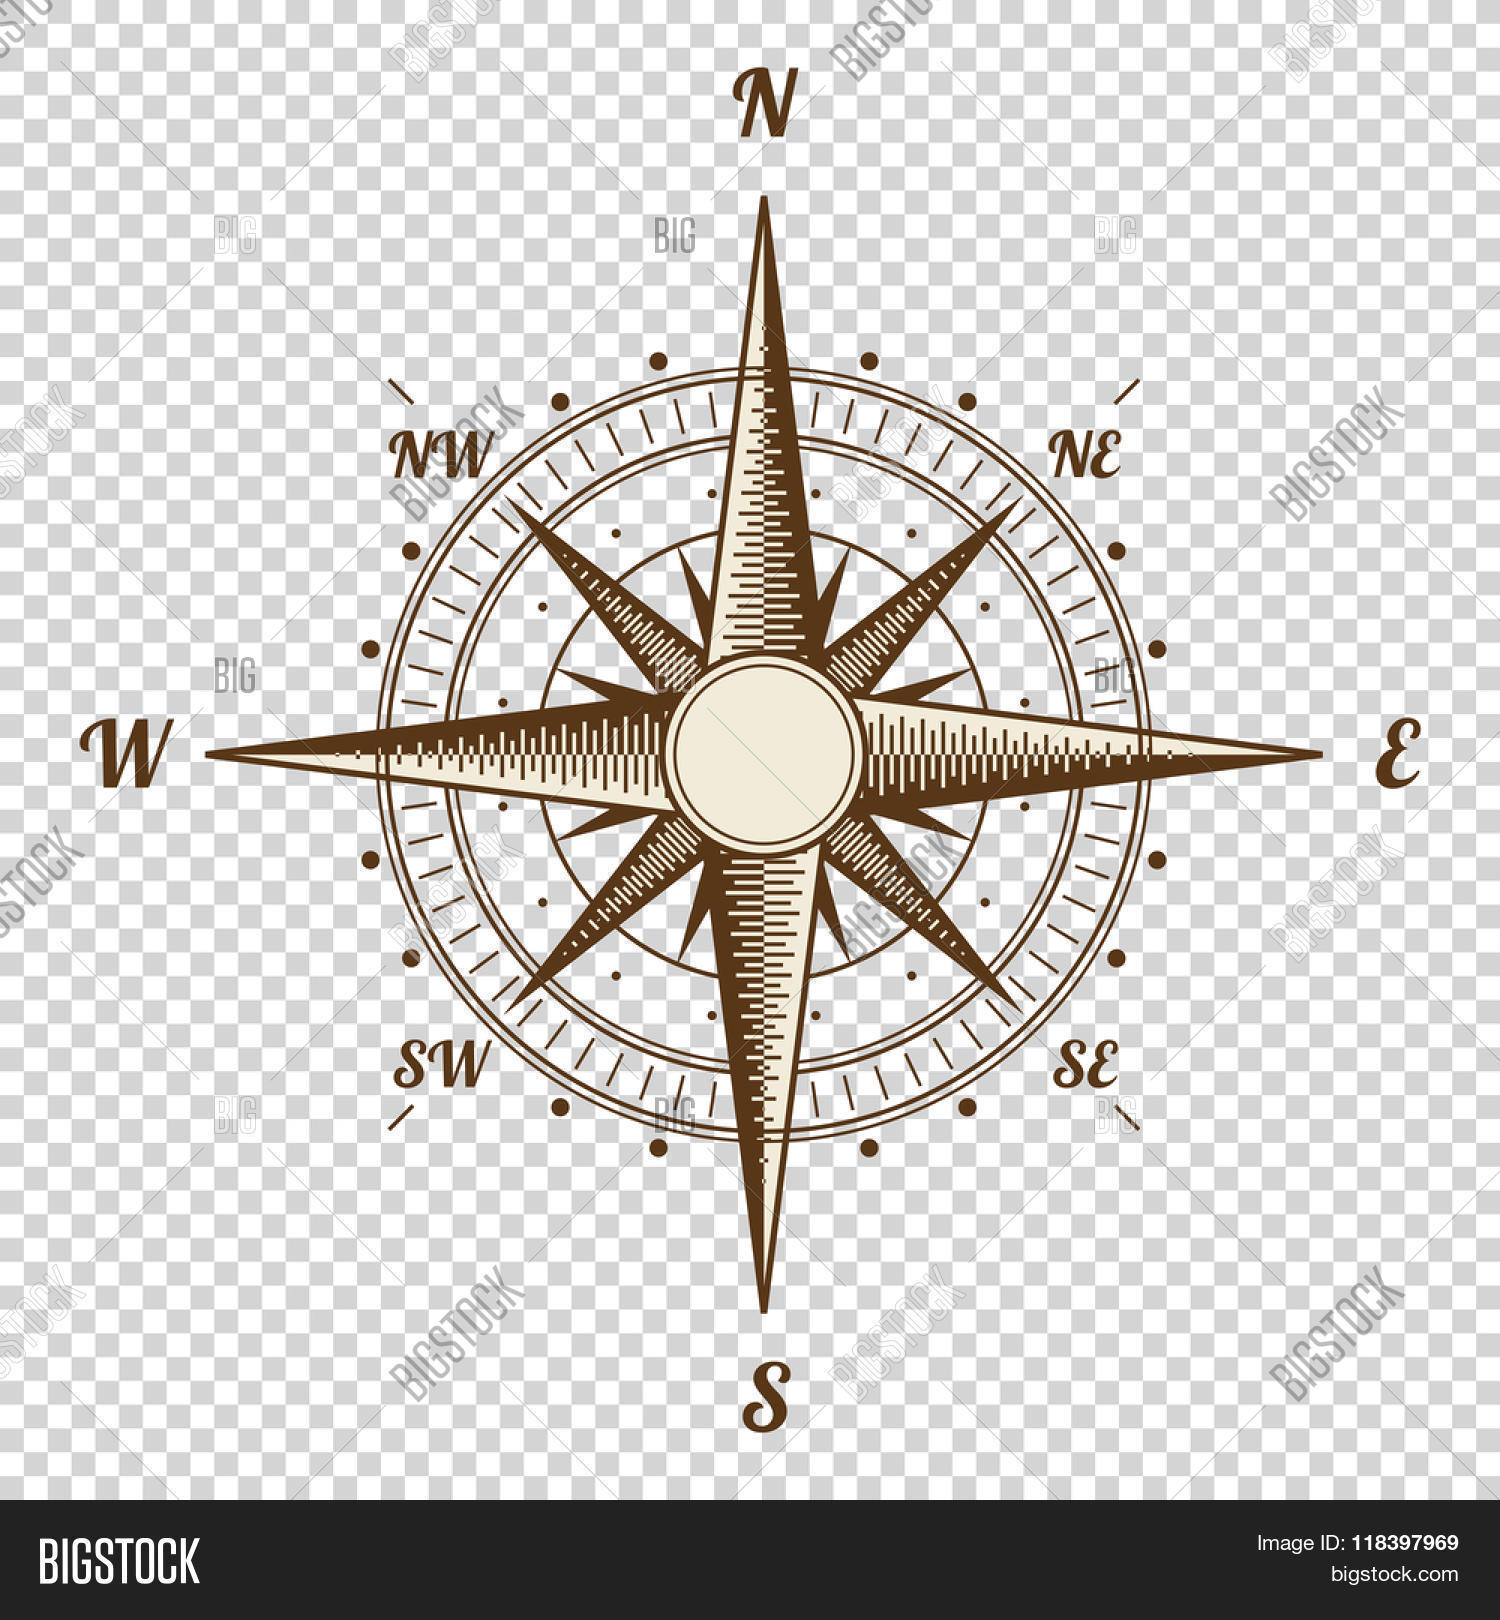 vector compass vector photo free trial bigstock